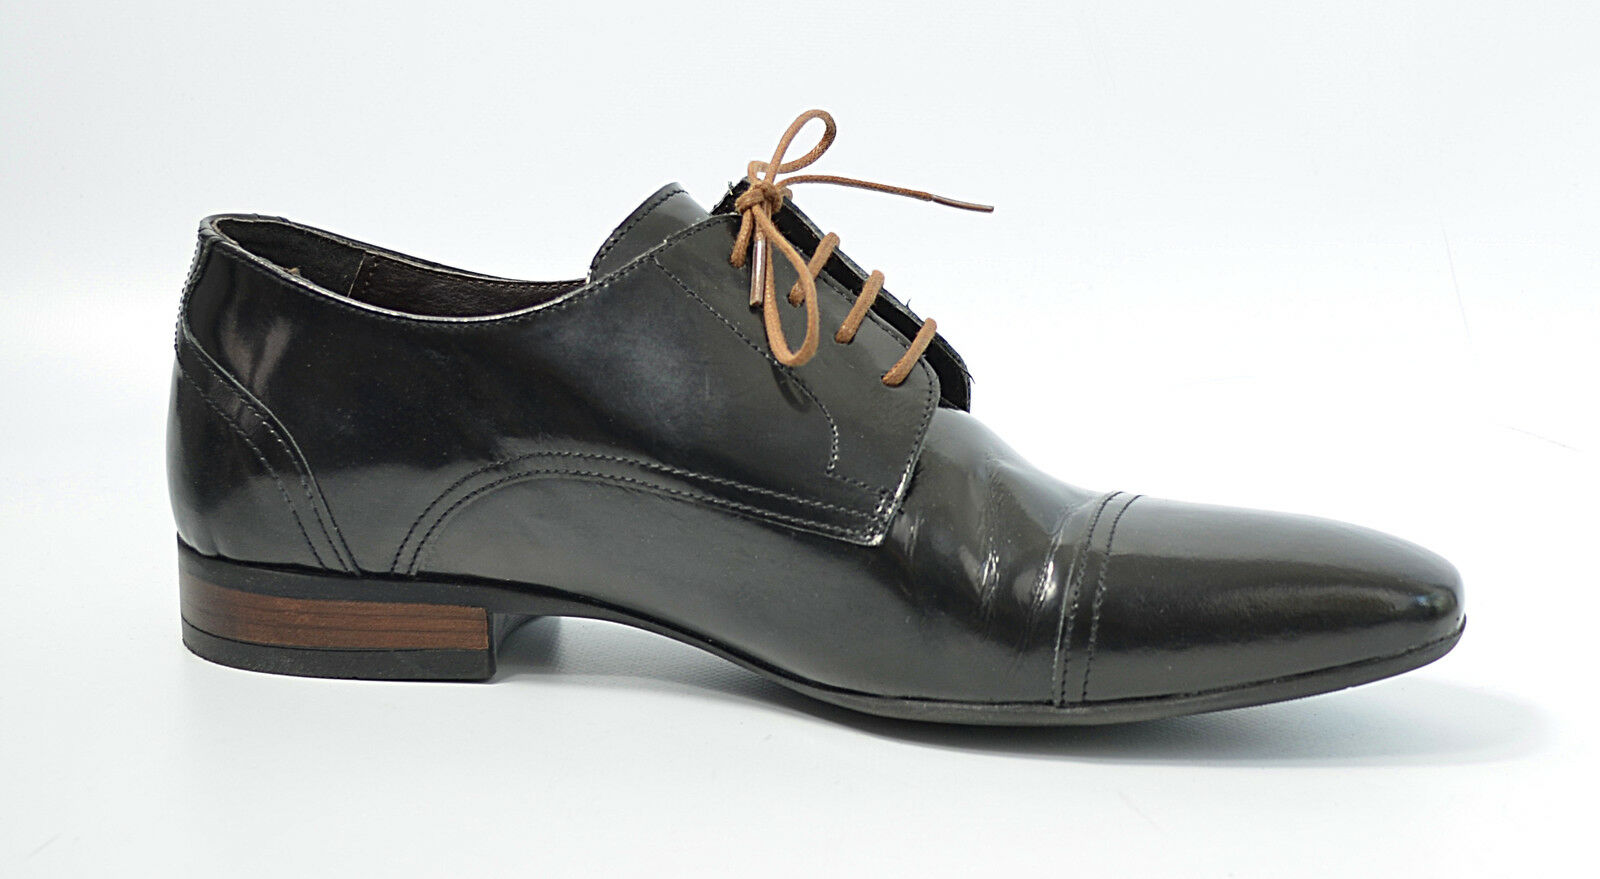 SAN MARINA Halbschuhe Serapo Gr. 40 Schuhe Leder,   Herren Schuhe 40 (V1) 05/17  M3 9dff3e